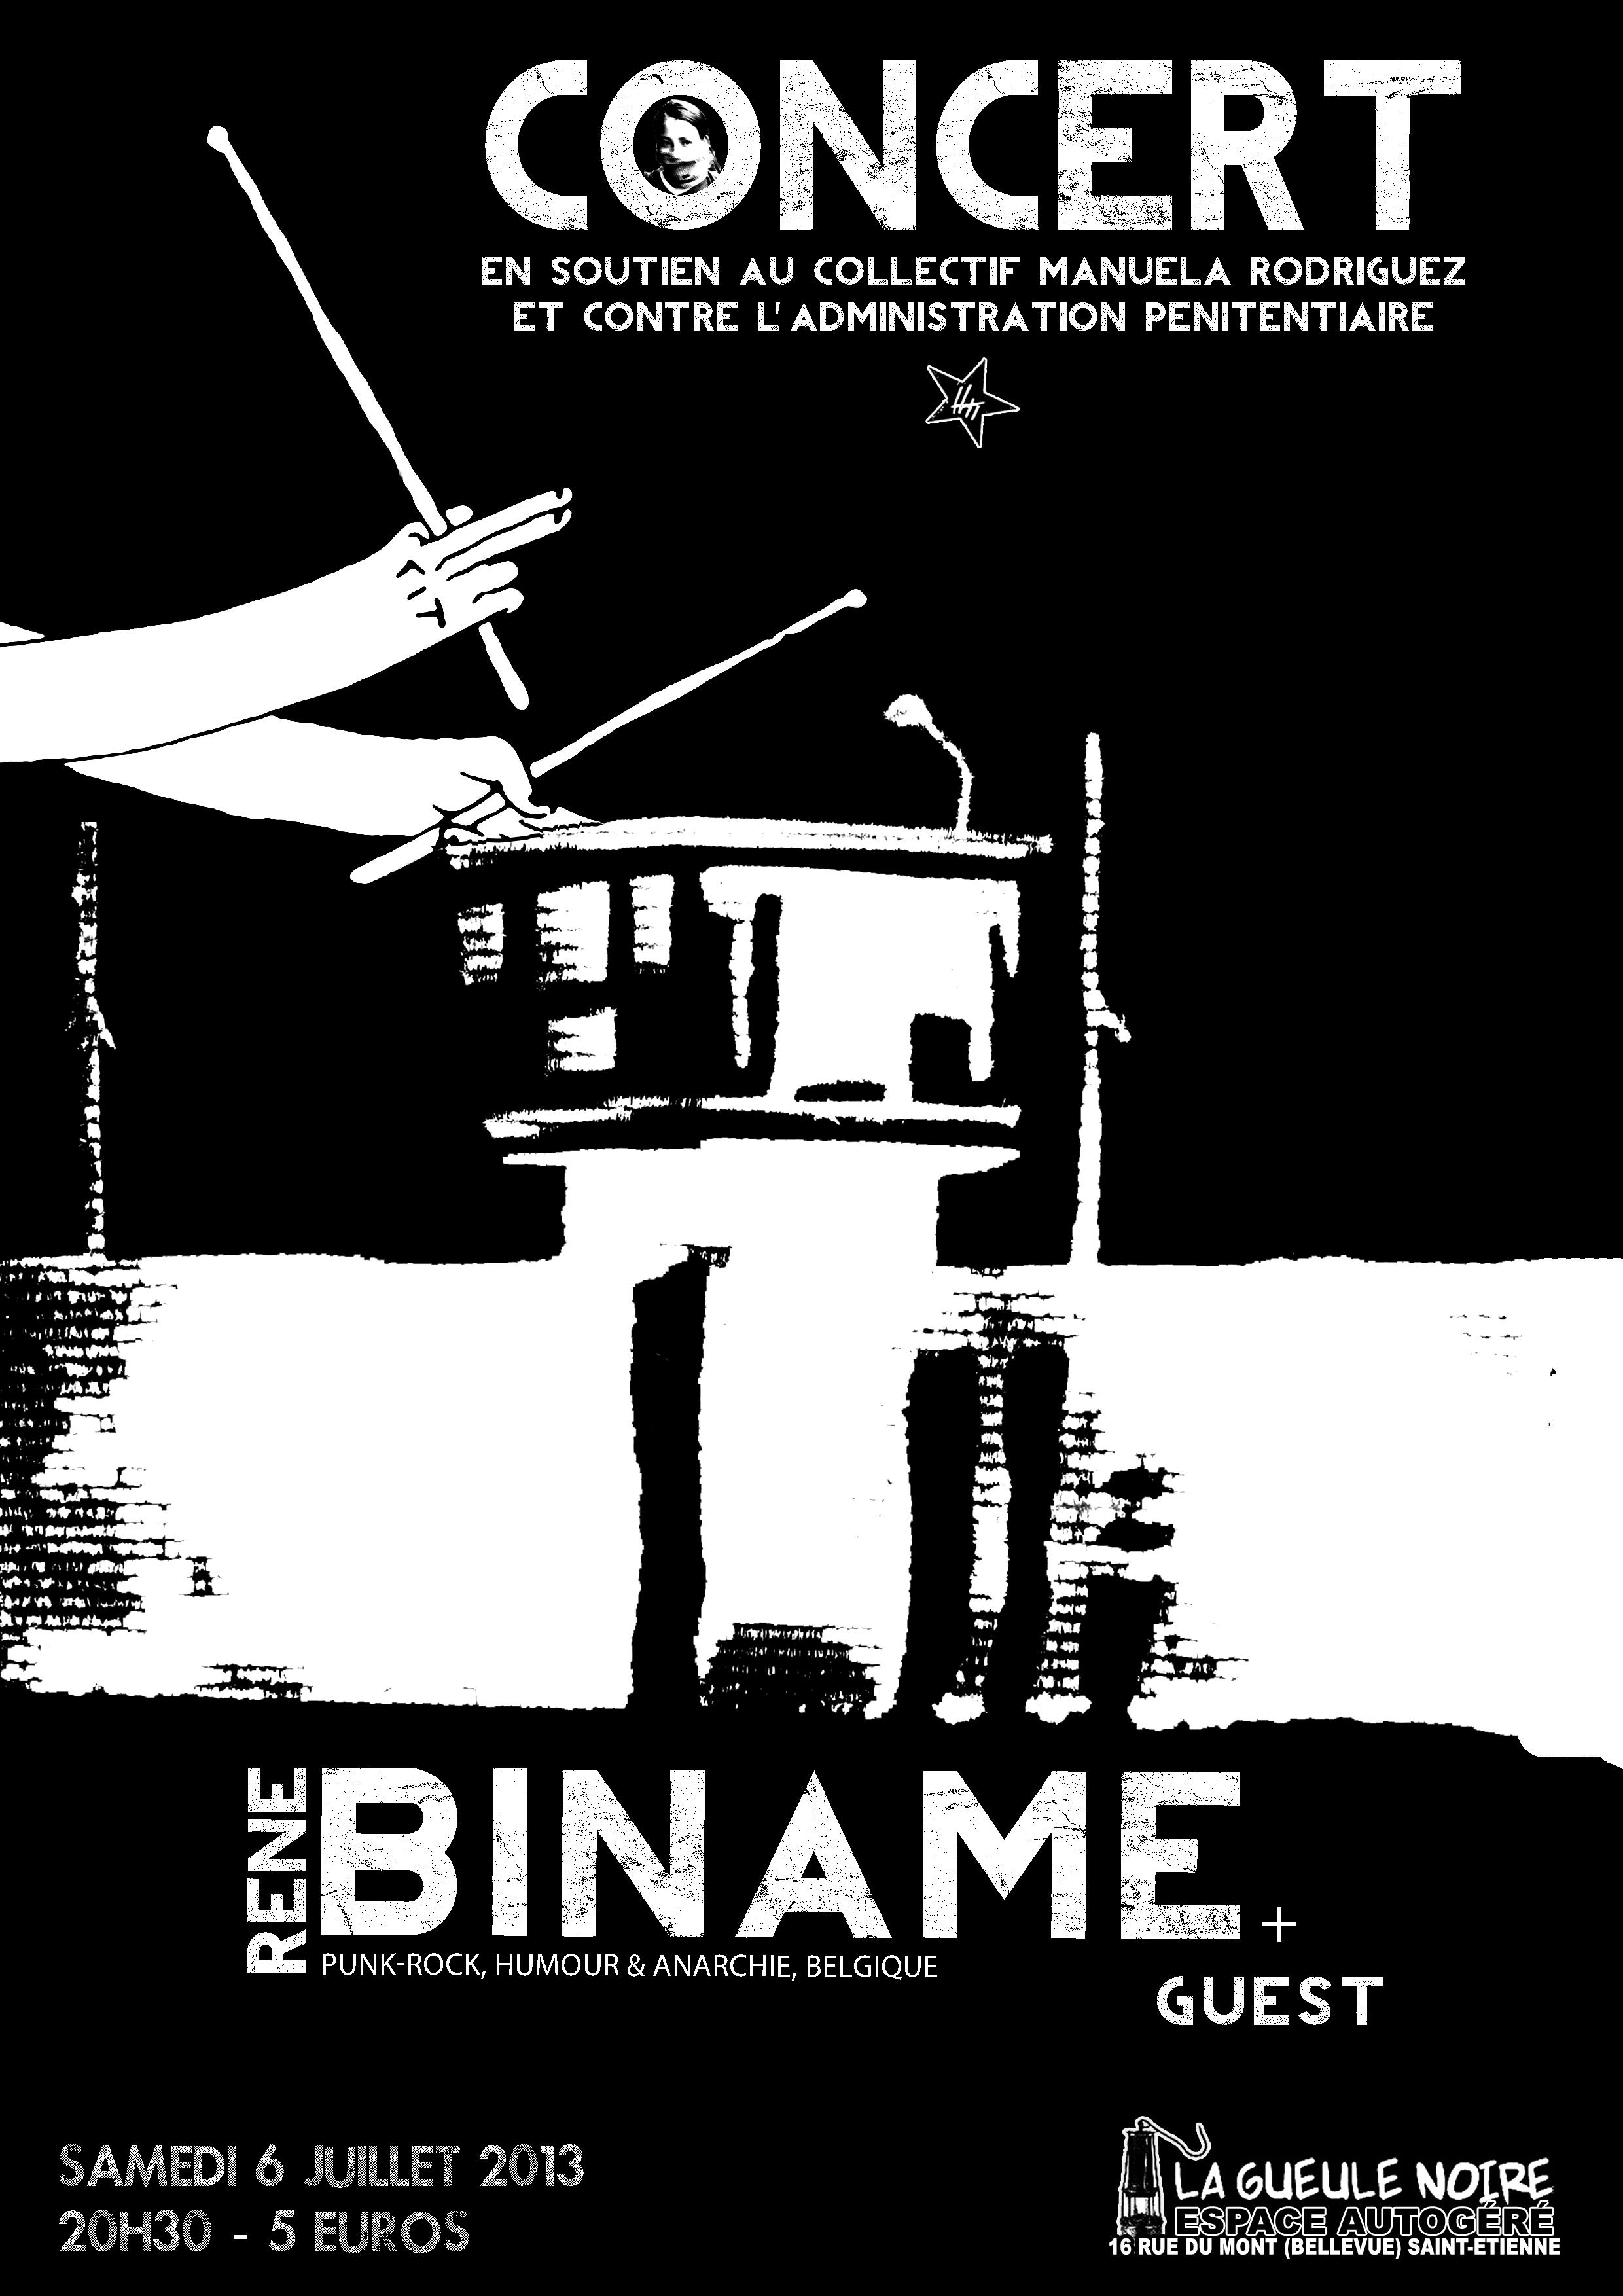 Concert Biname - 6 juillet 2013 - Saint Etienne